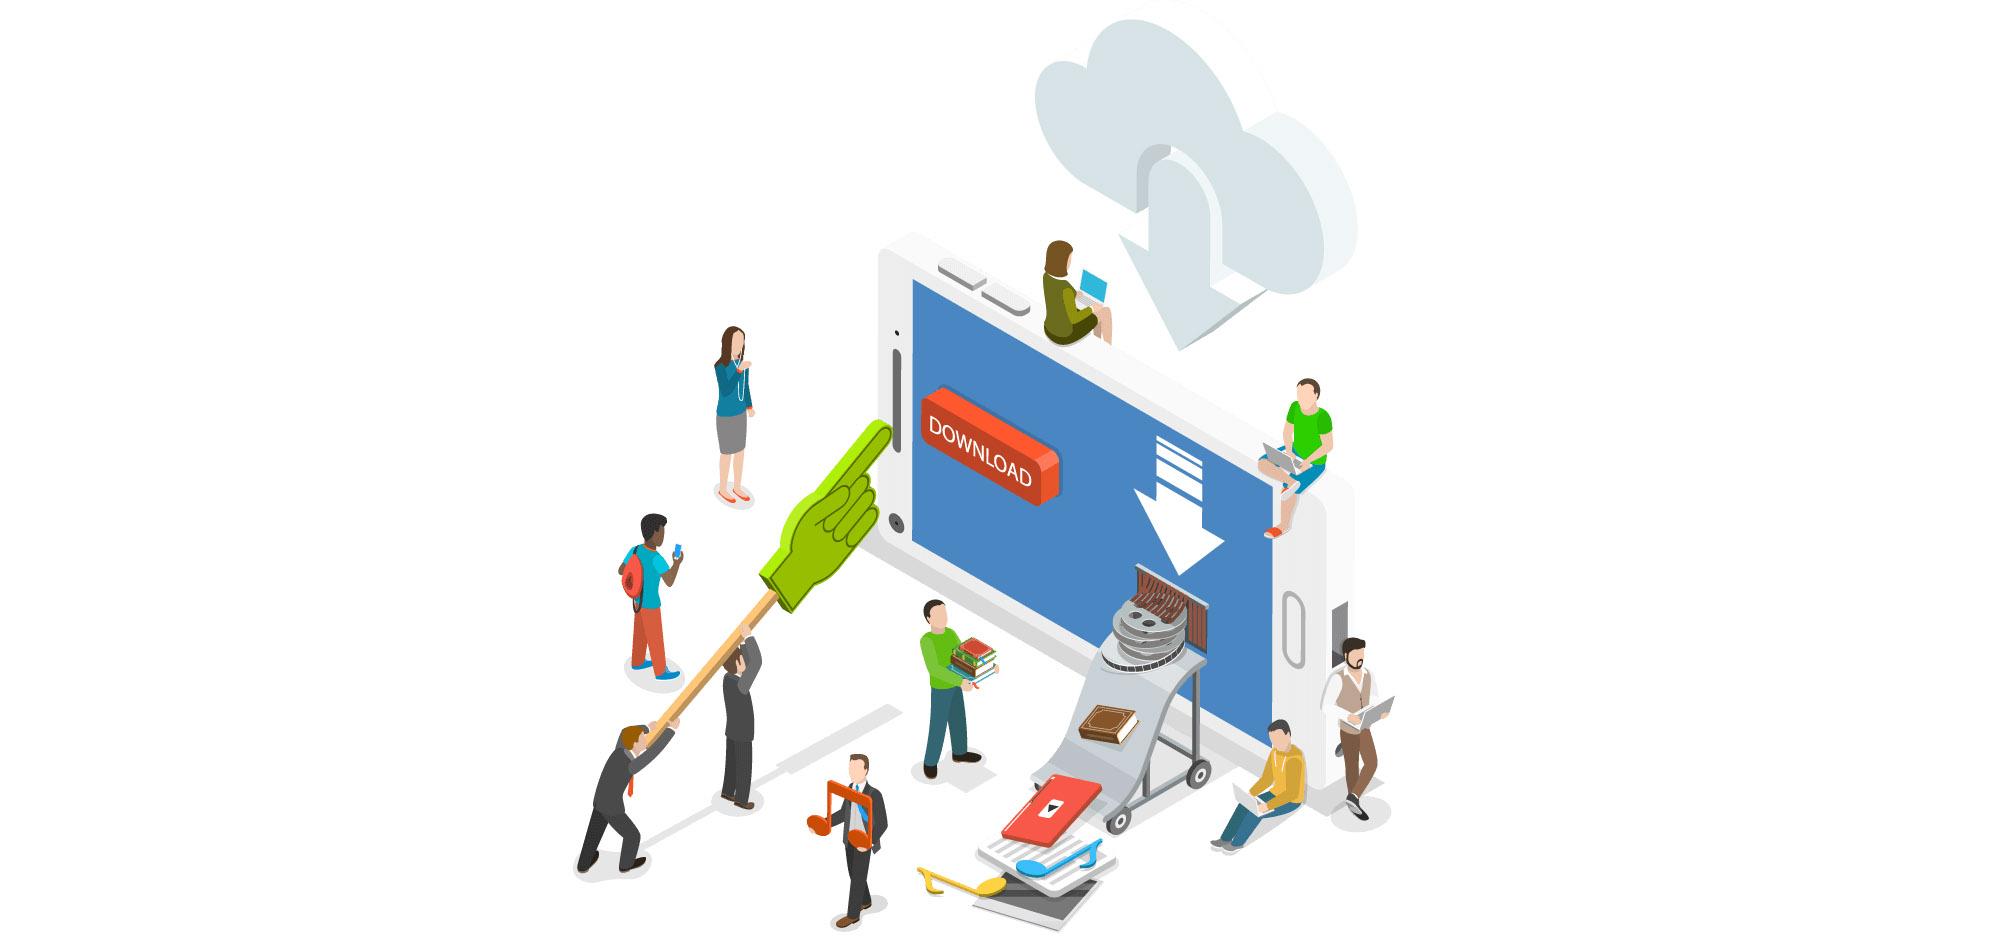 فروش آنلاین کالای دیجیتال